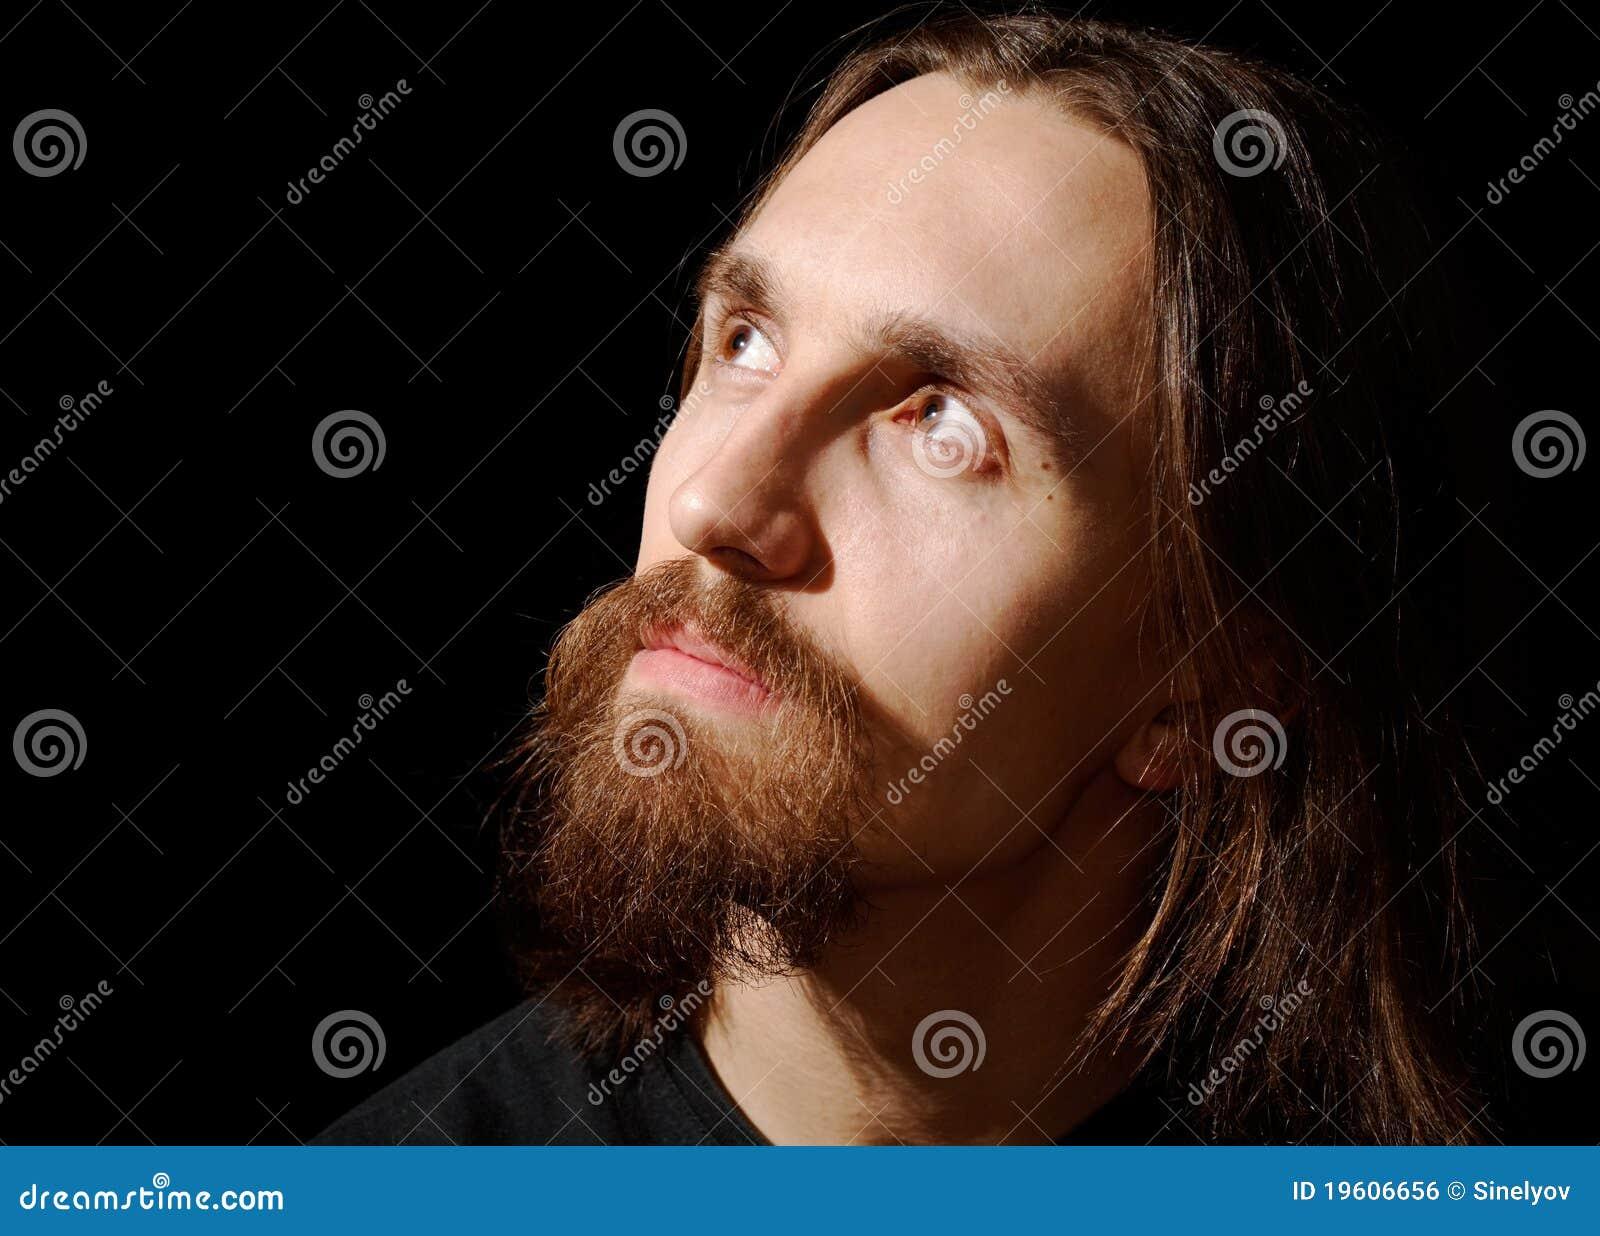 Young boy long hair anal gay joey perelli